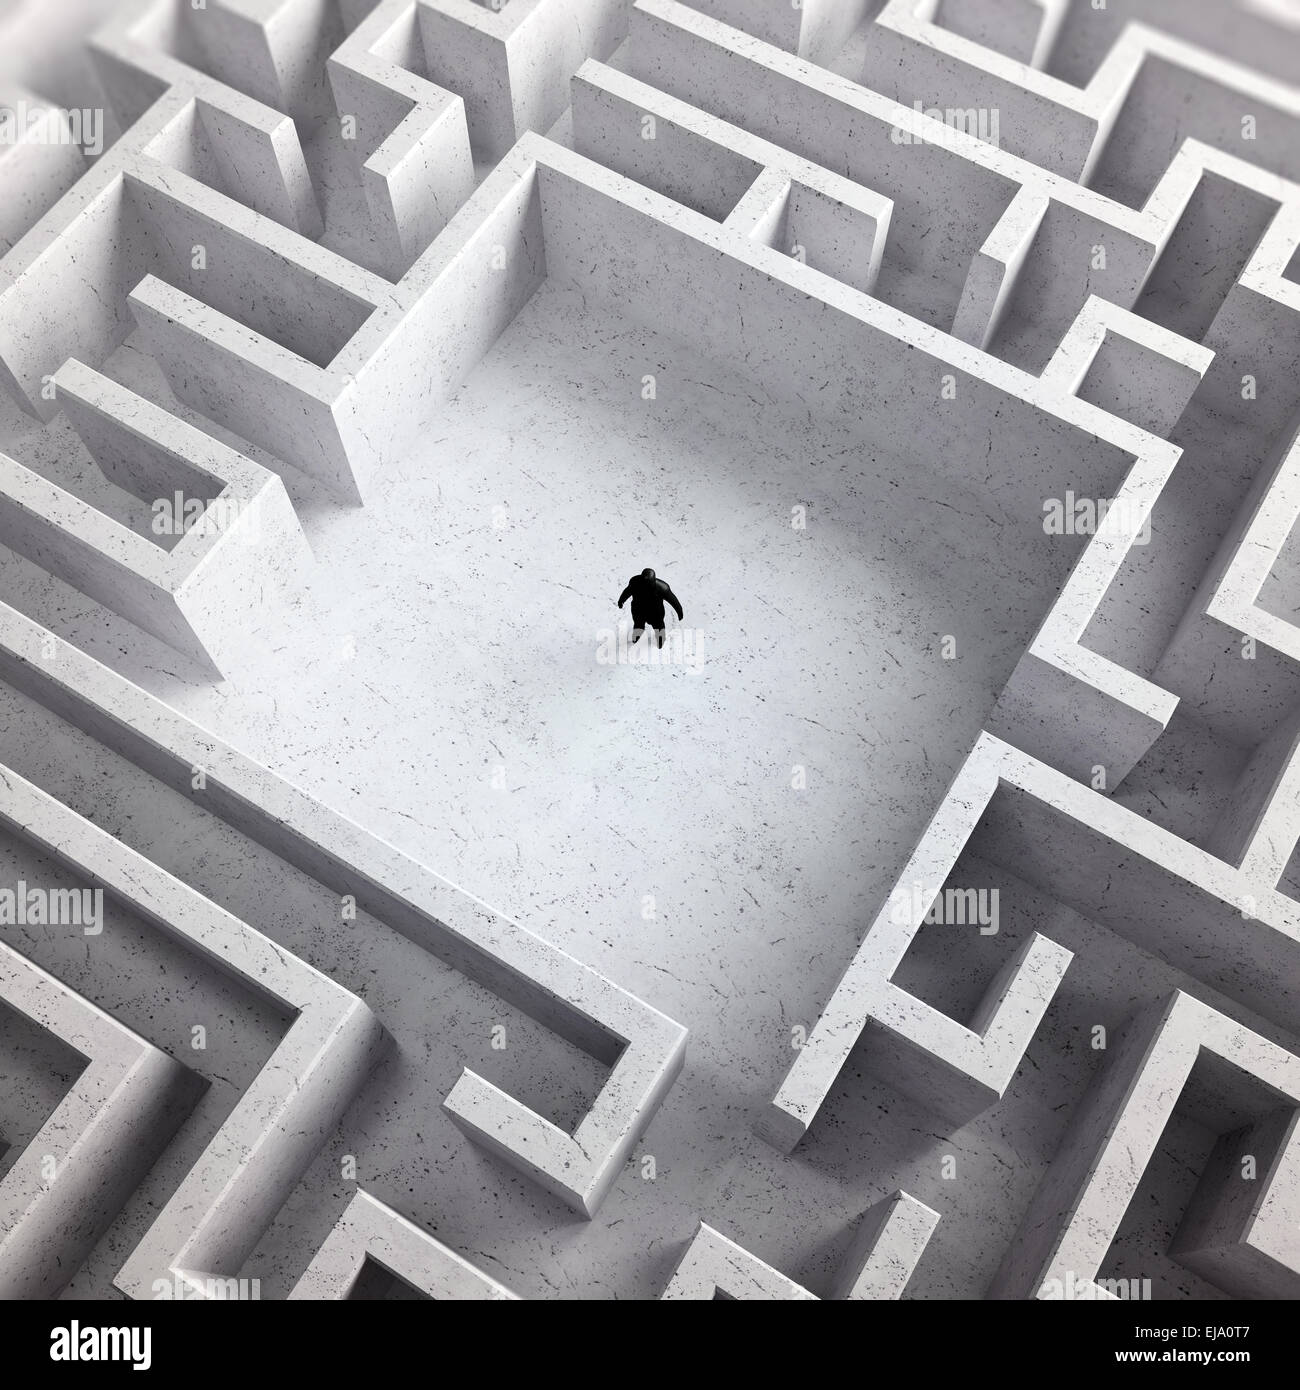 Kleiner Mann im Inneren ein endloses Labyrinth Stockbild